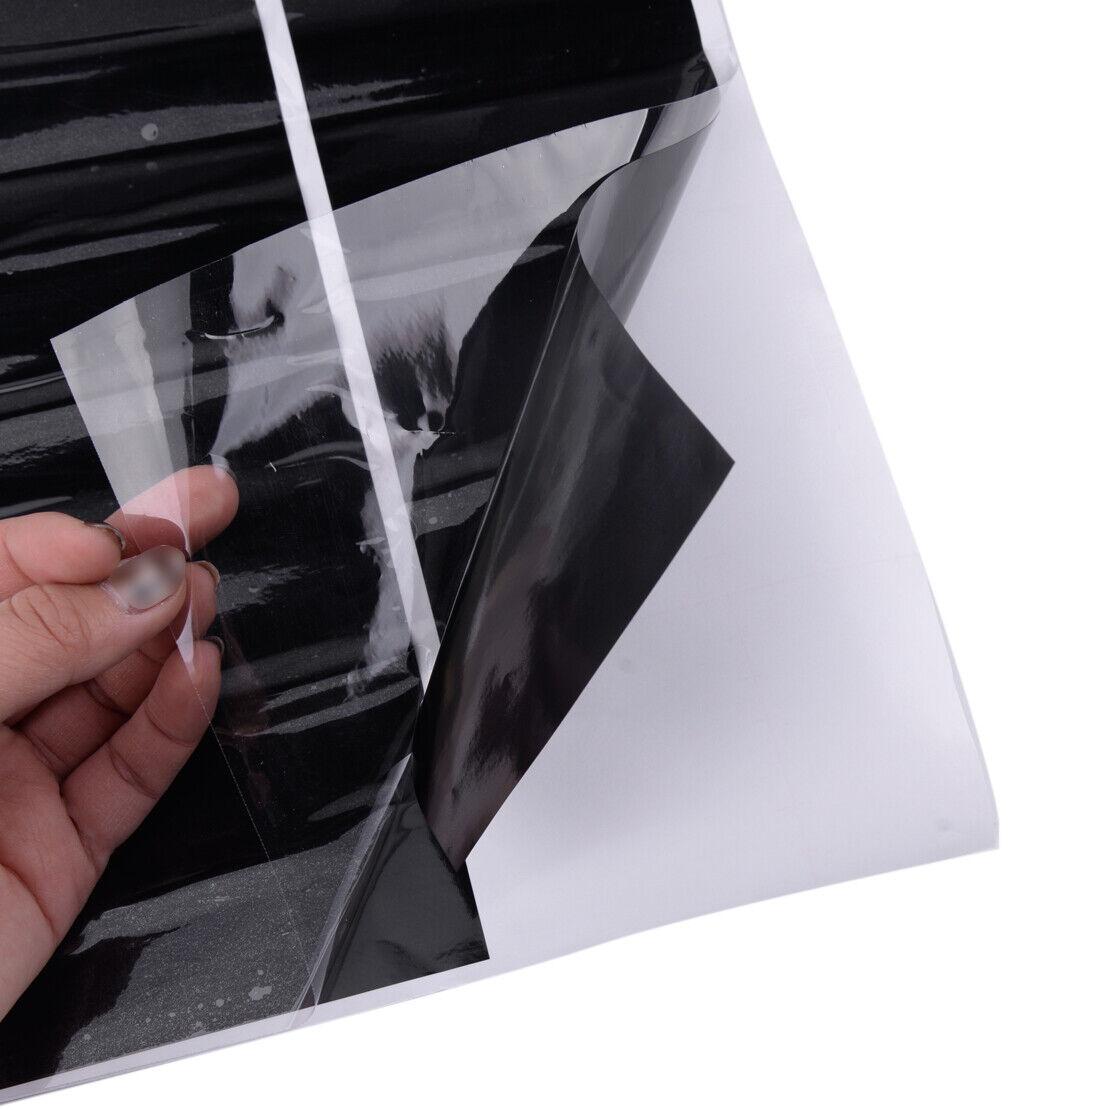 Motorhaube Aufkleber Vinyl Streifen Stripes für MINI Cooper R50 R53 R56 R55 R57